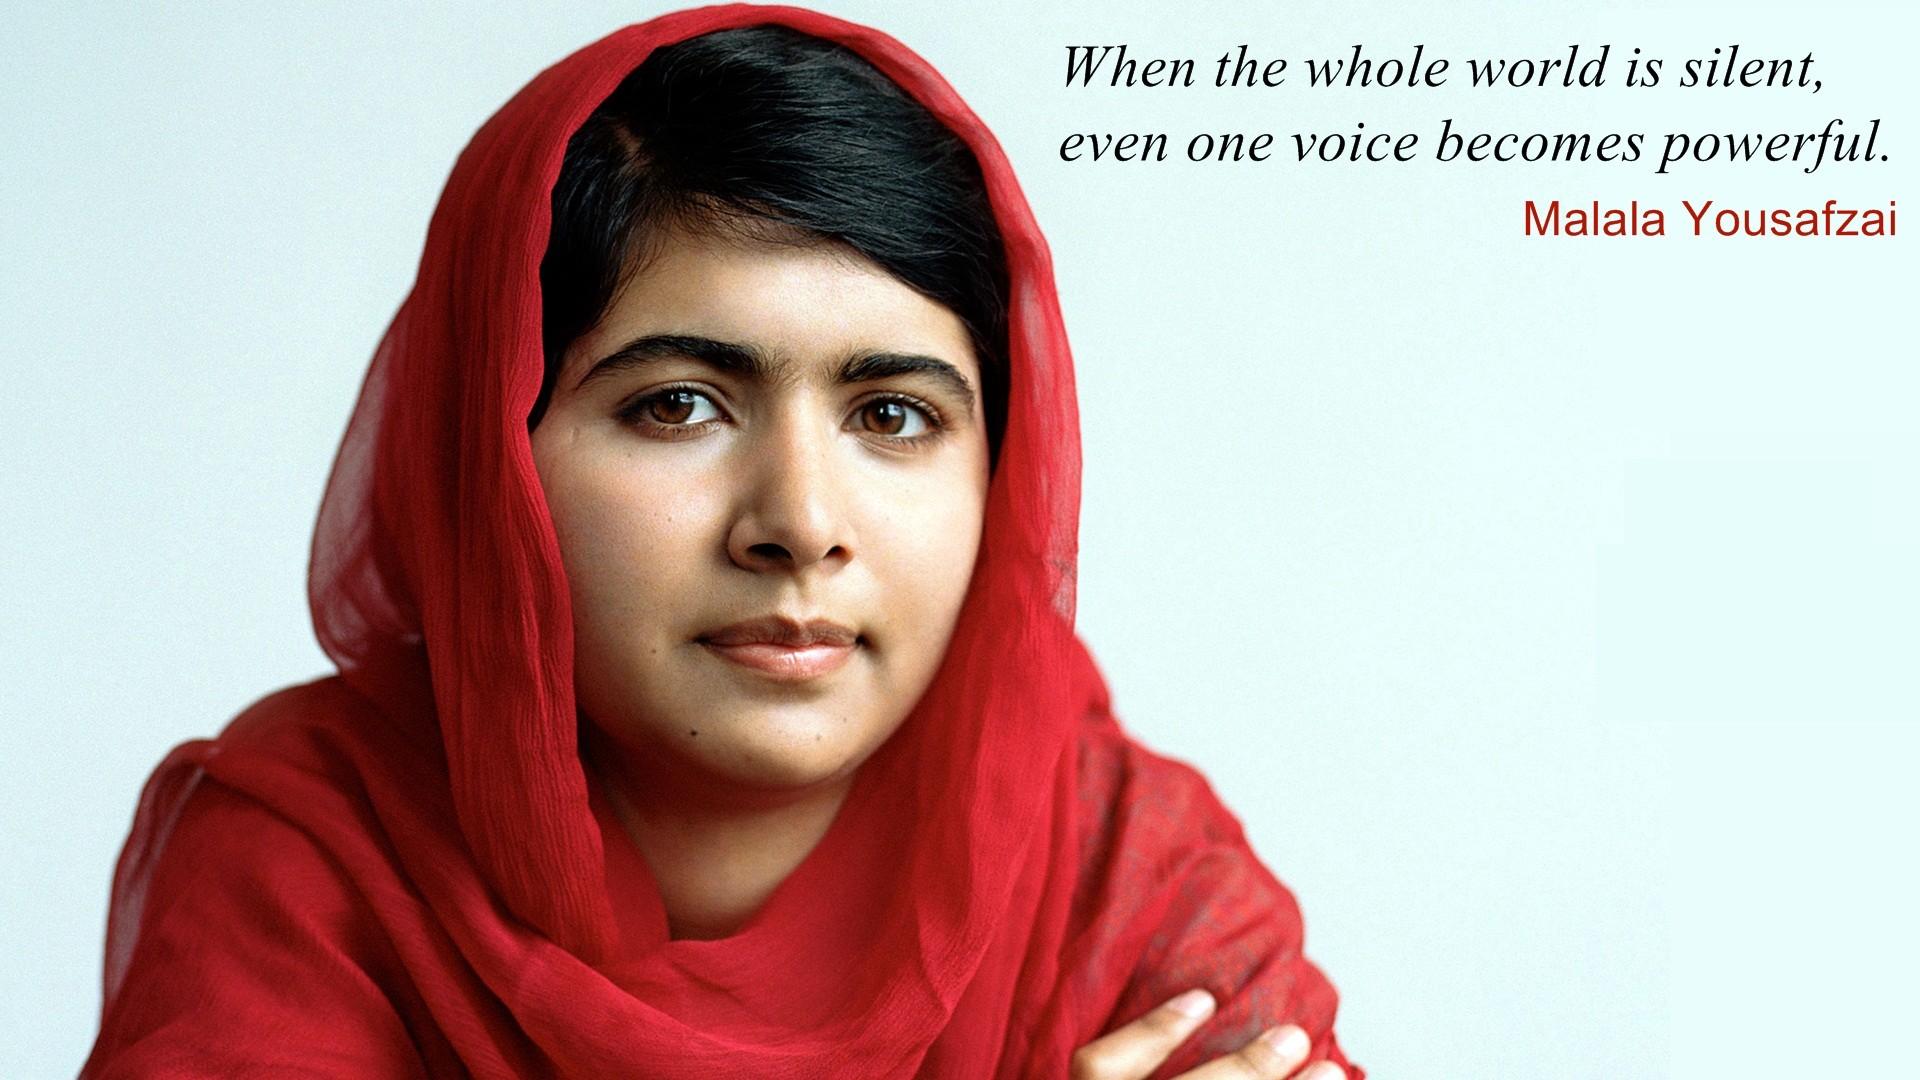 Malala Yousafzai Wallpaper 1920x1080 63701